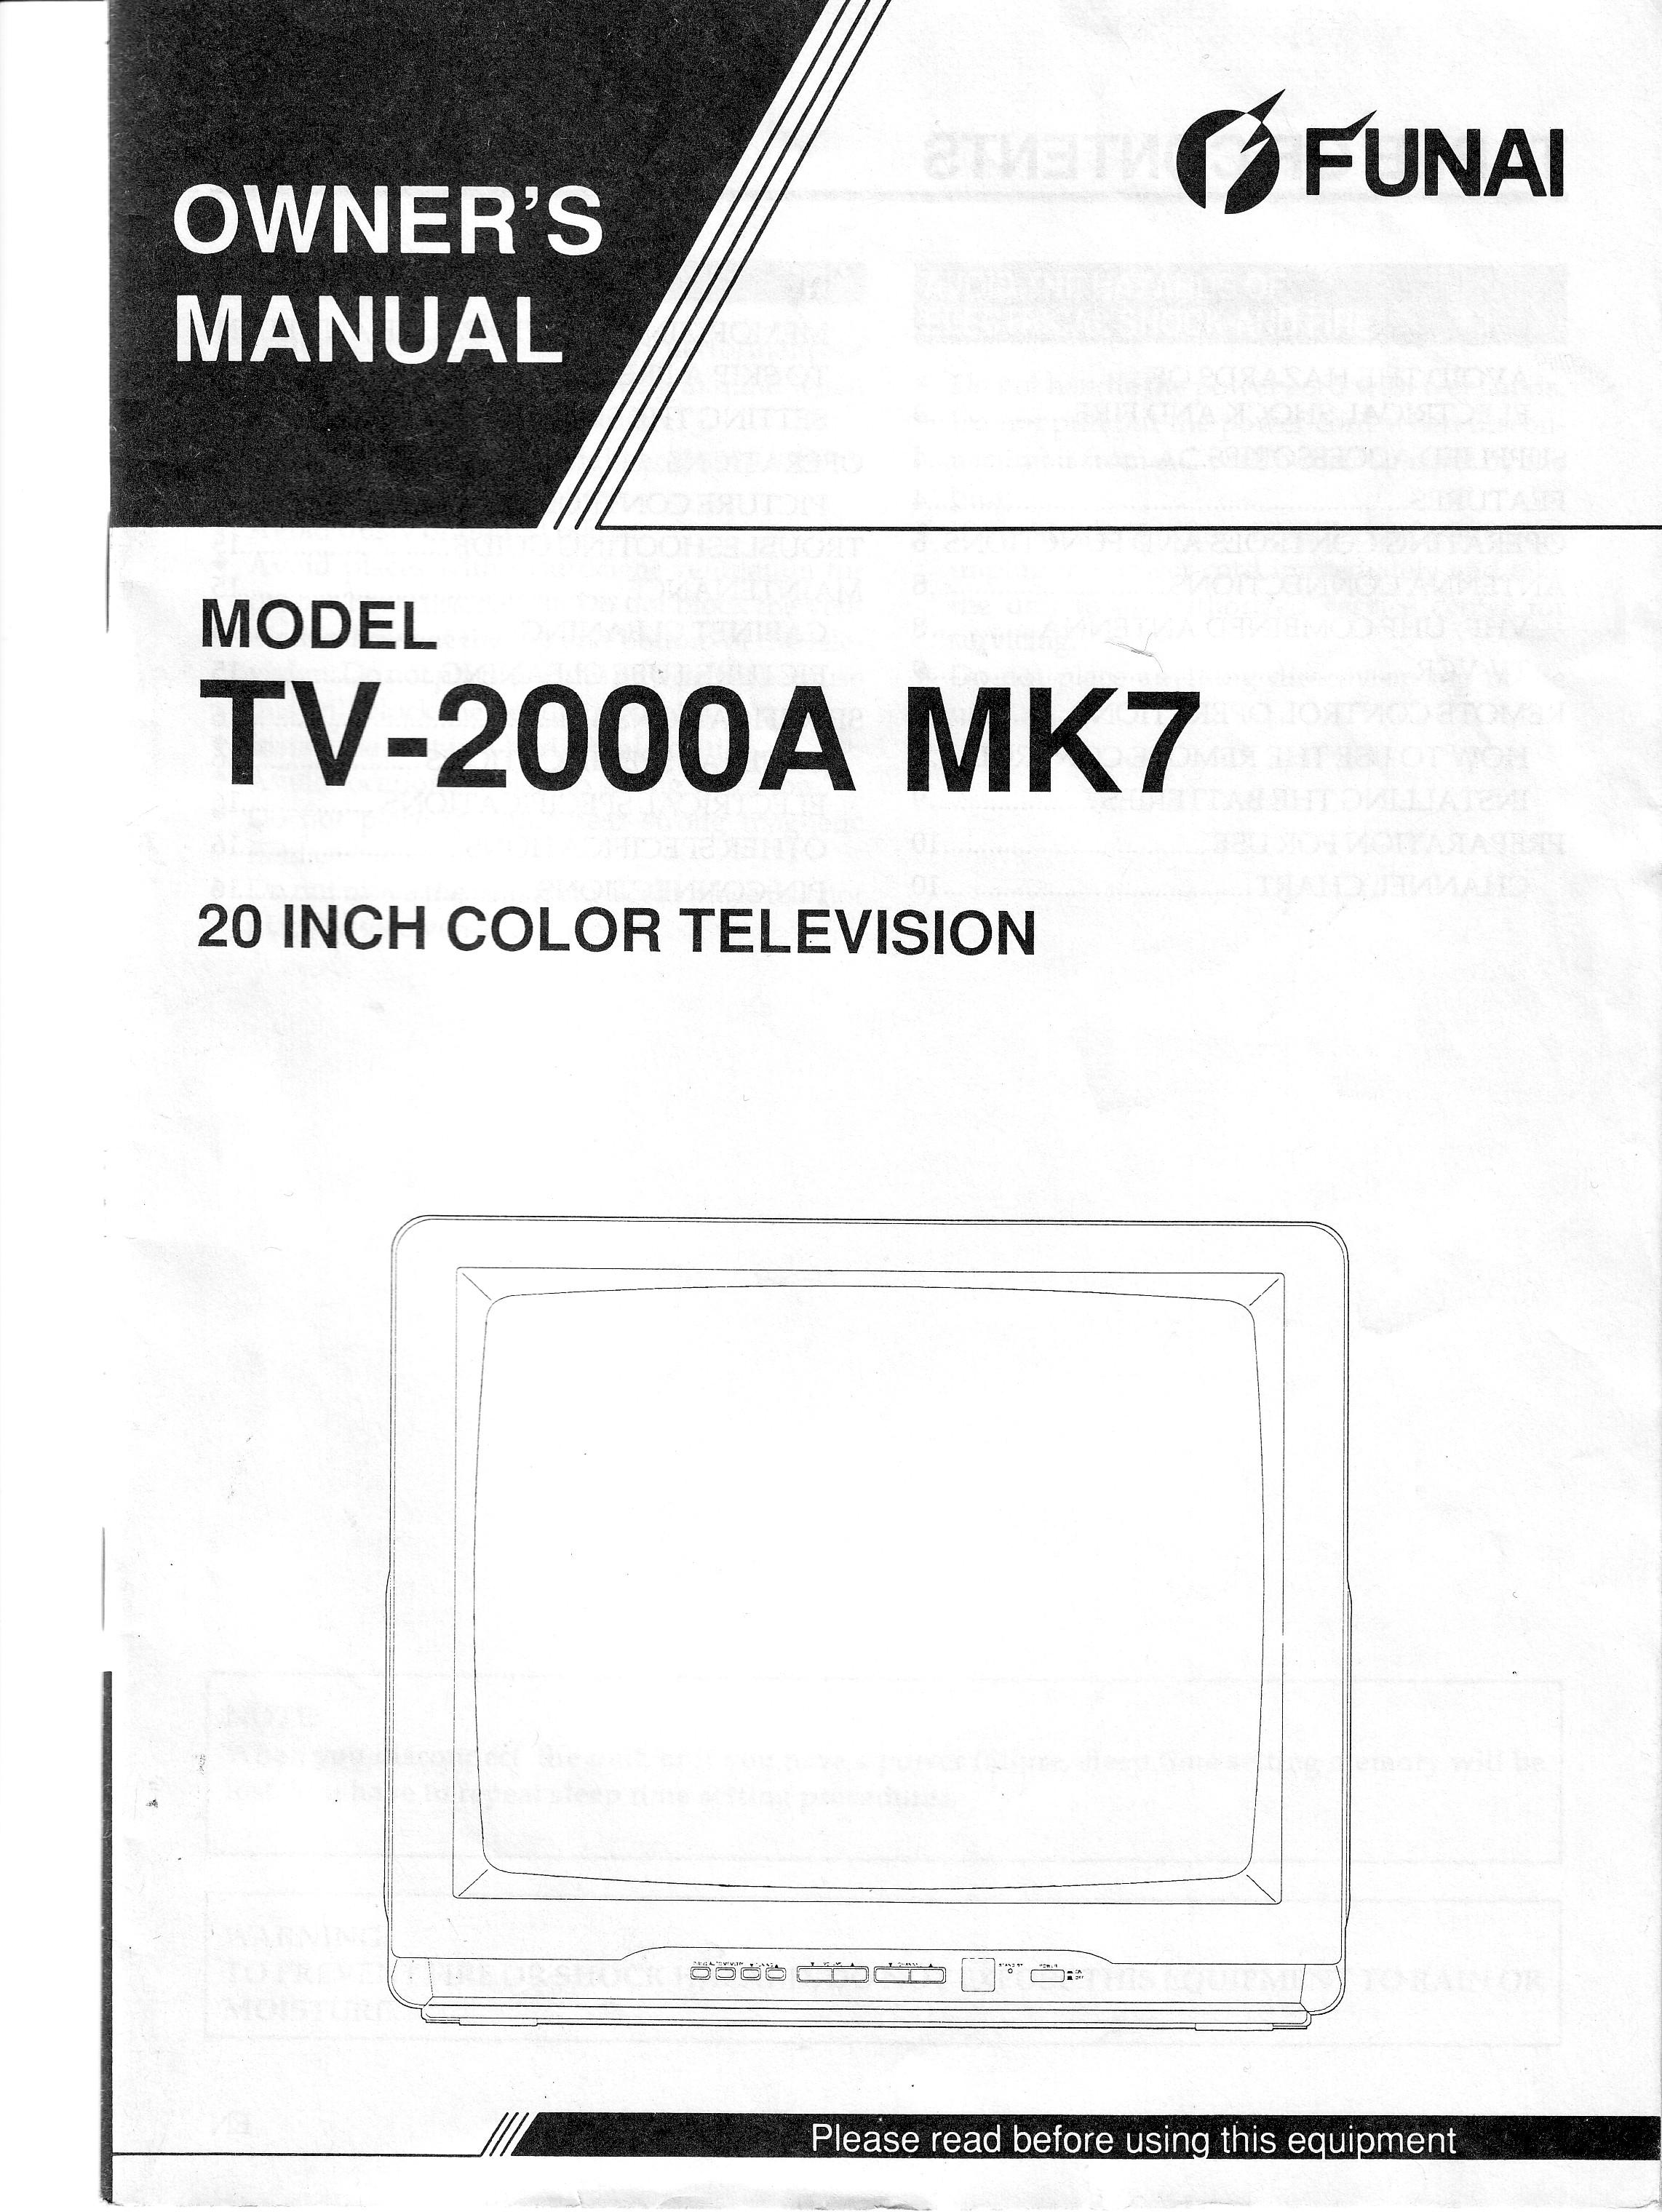 Funai tv 2000a mk7 инструкция